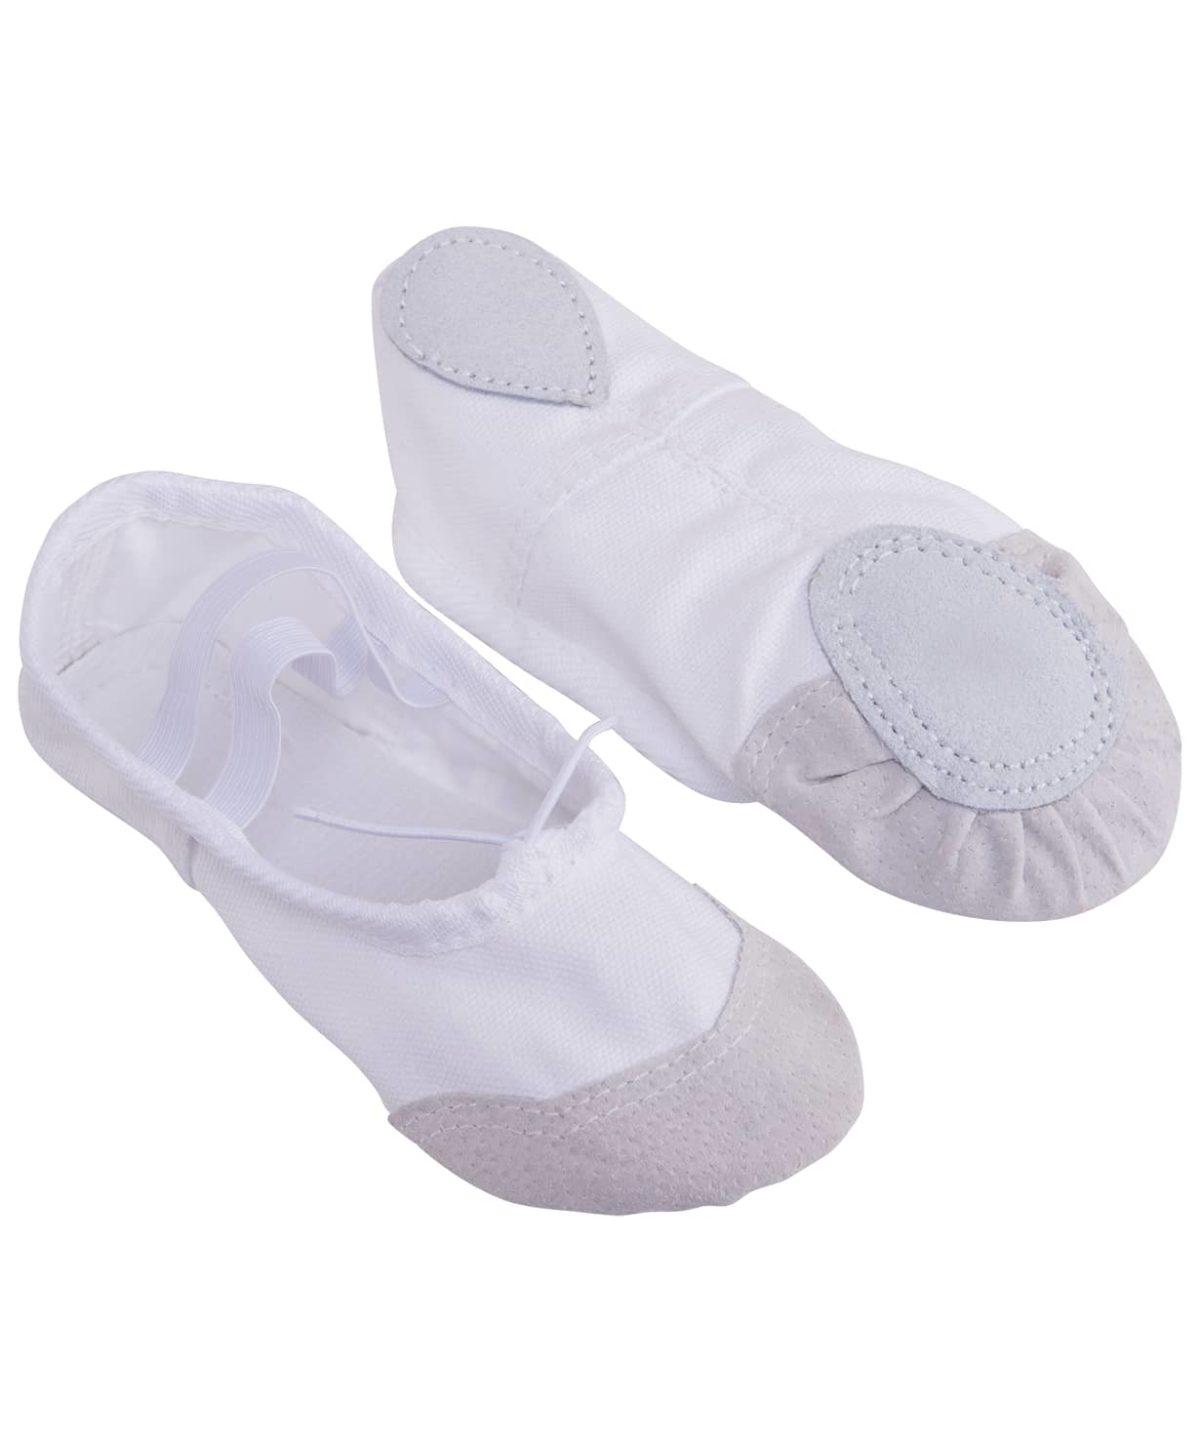 AMELY Балетки текстиль (38-42) SL-01: белый - 1